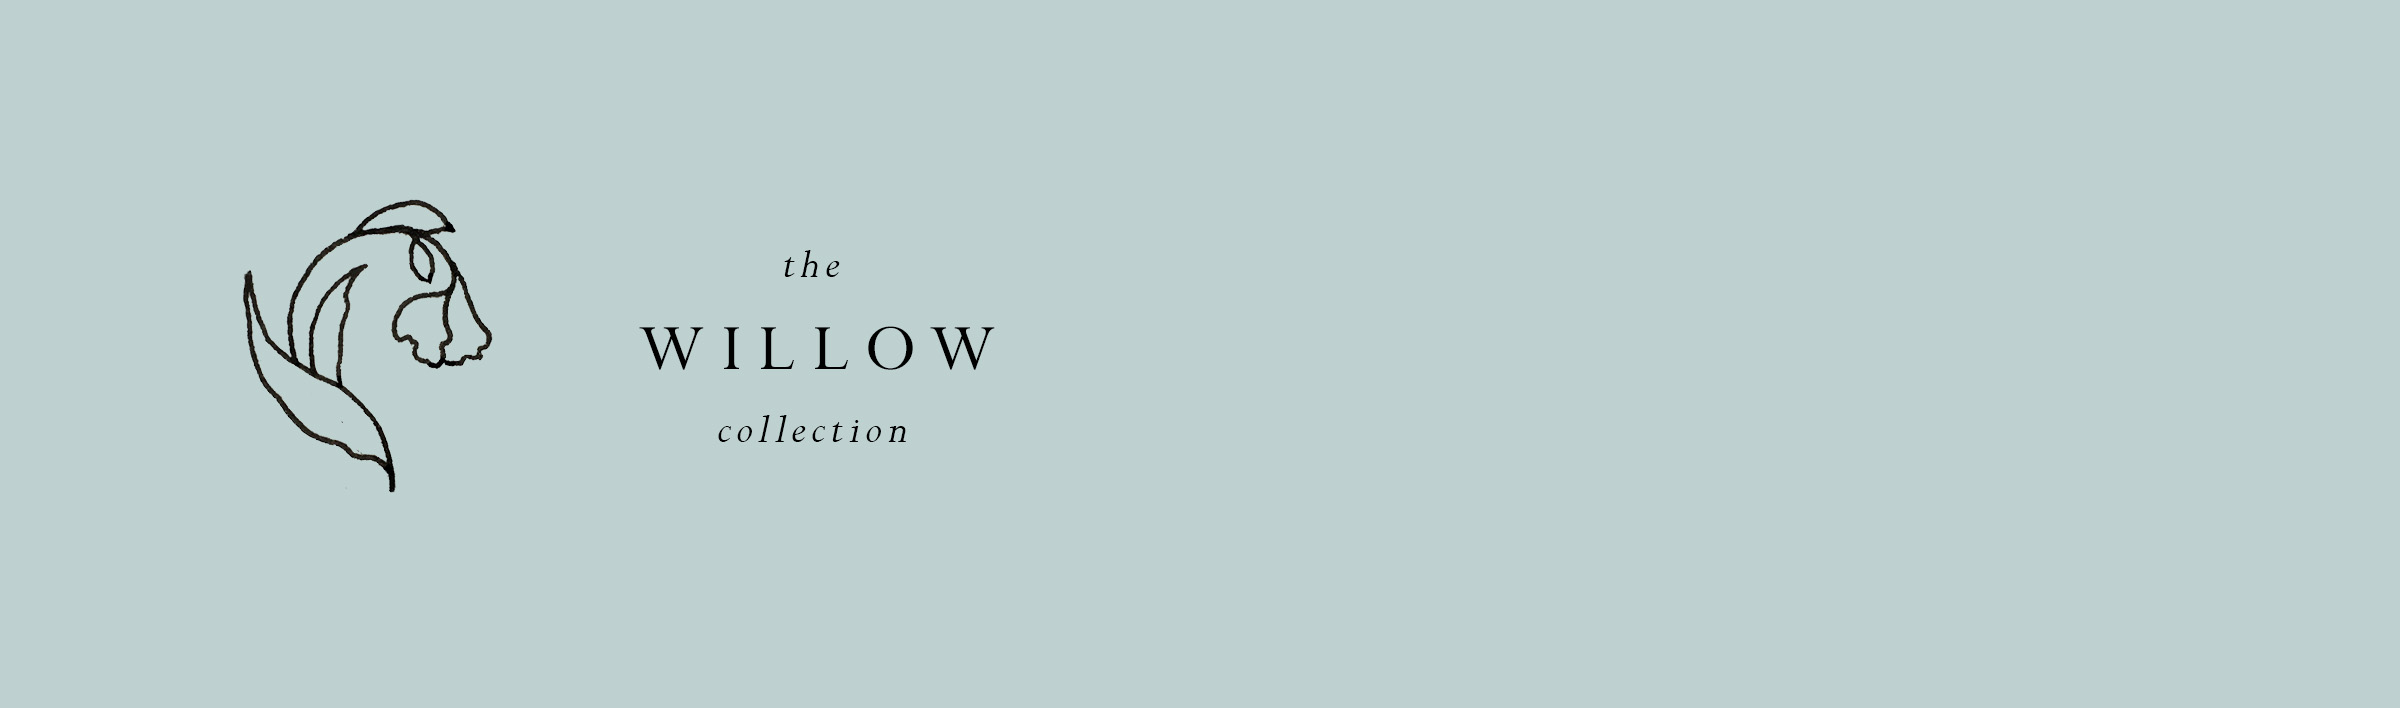 willow_banner2.jpg